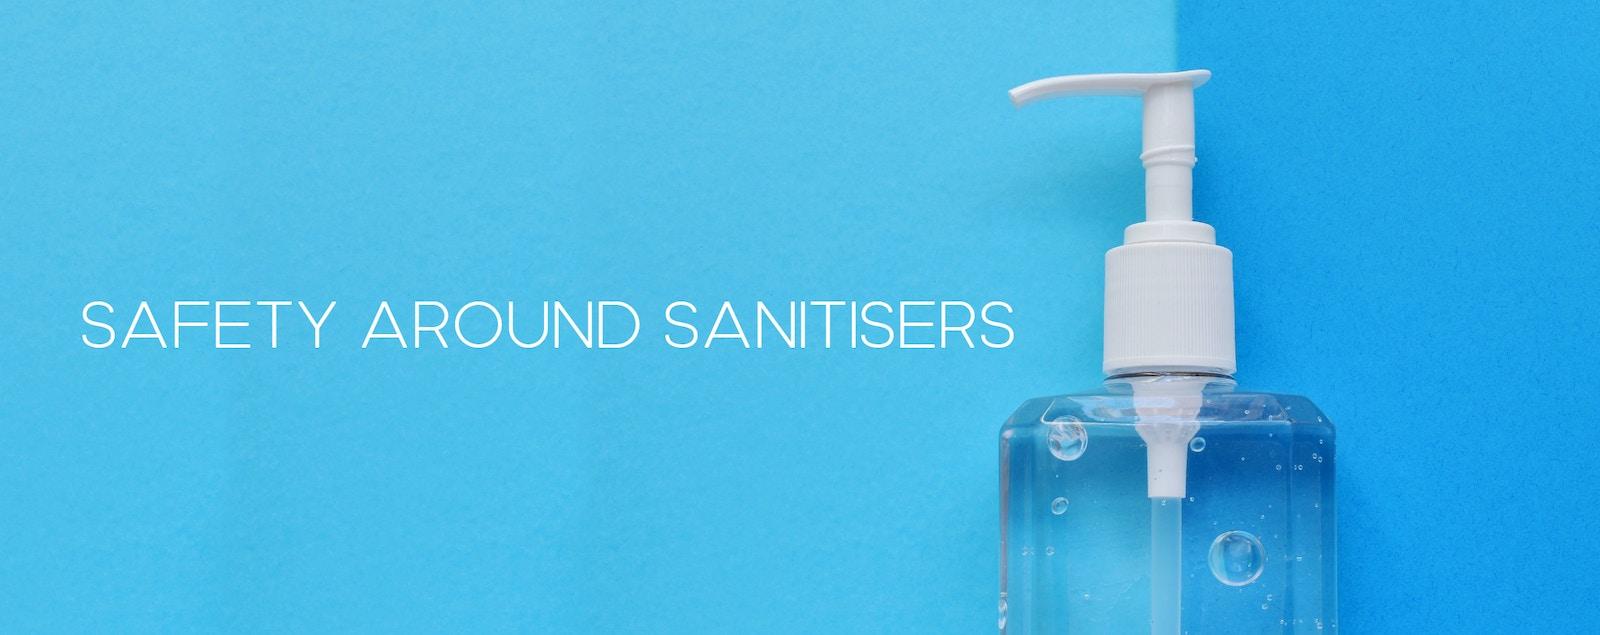 Staying Safe Around Hand Sanitiser